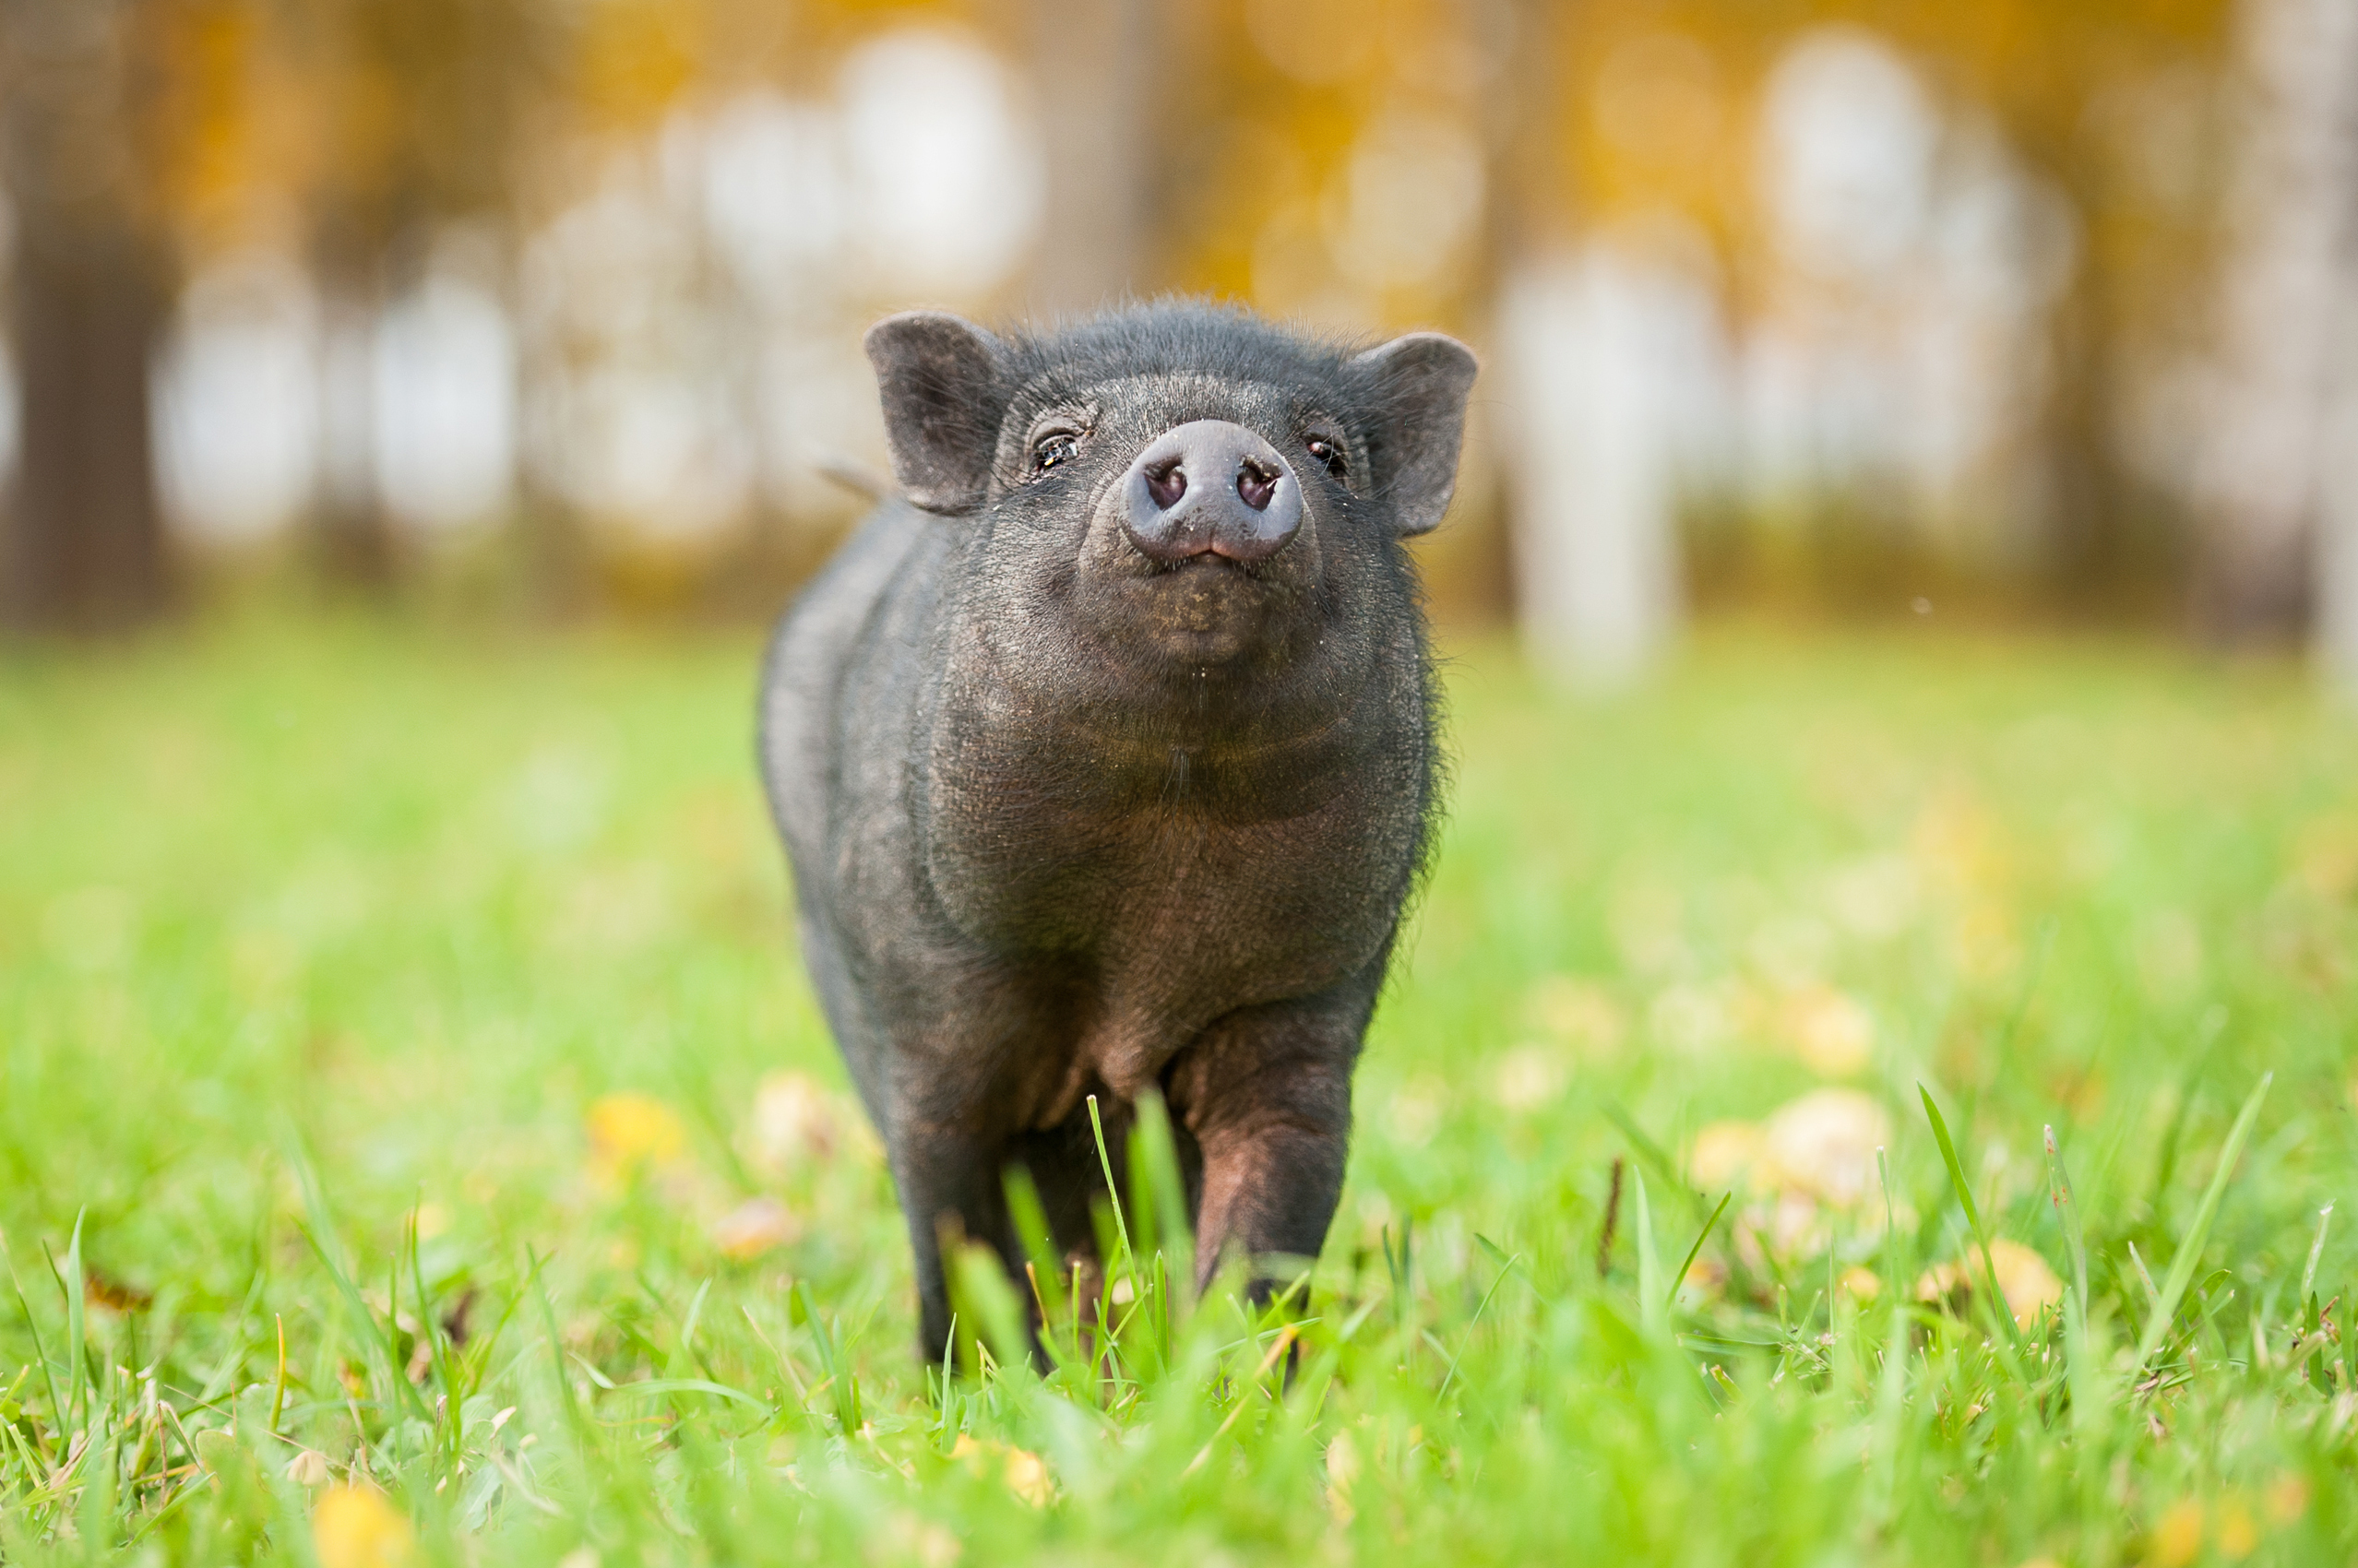 Funny mini piggy walking on the grass